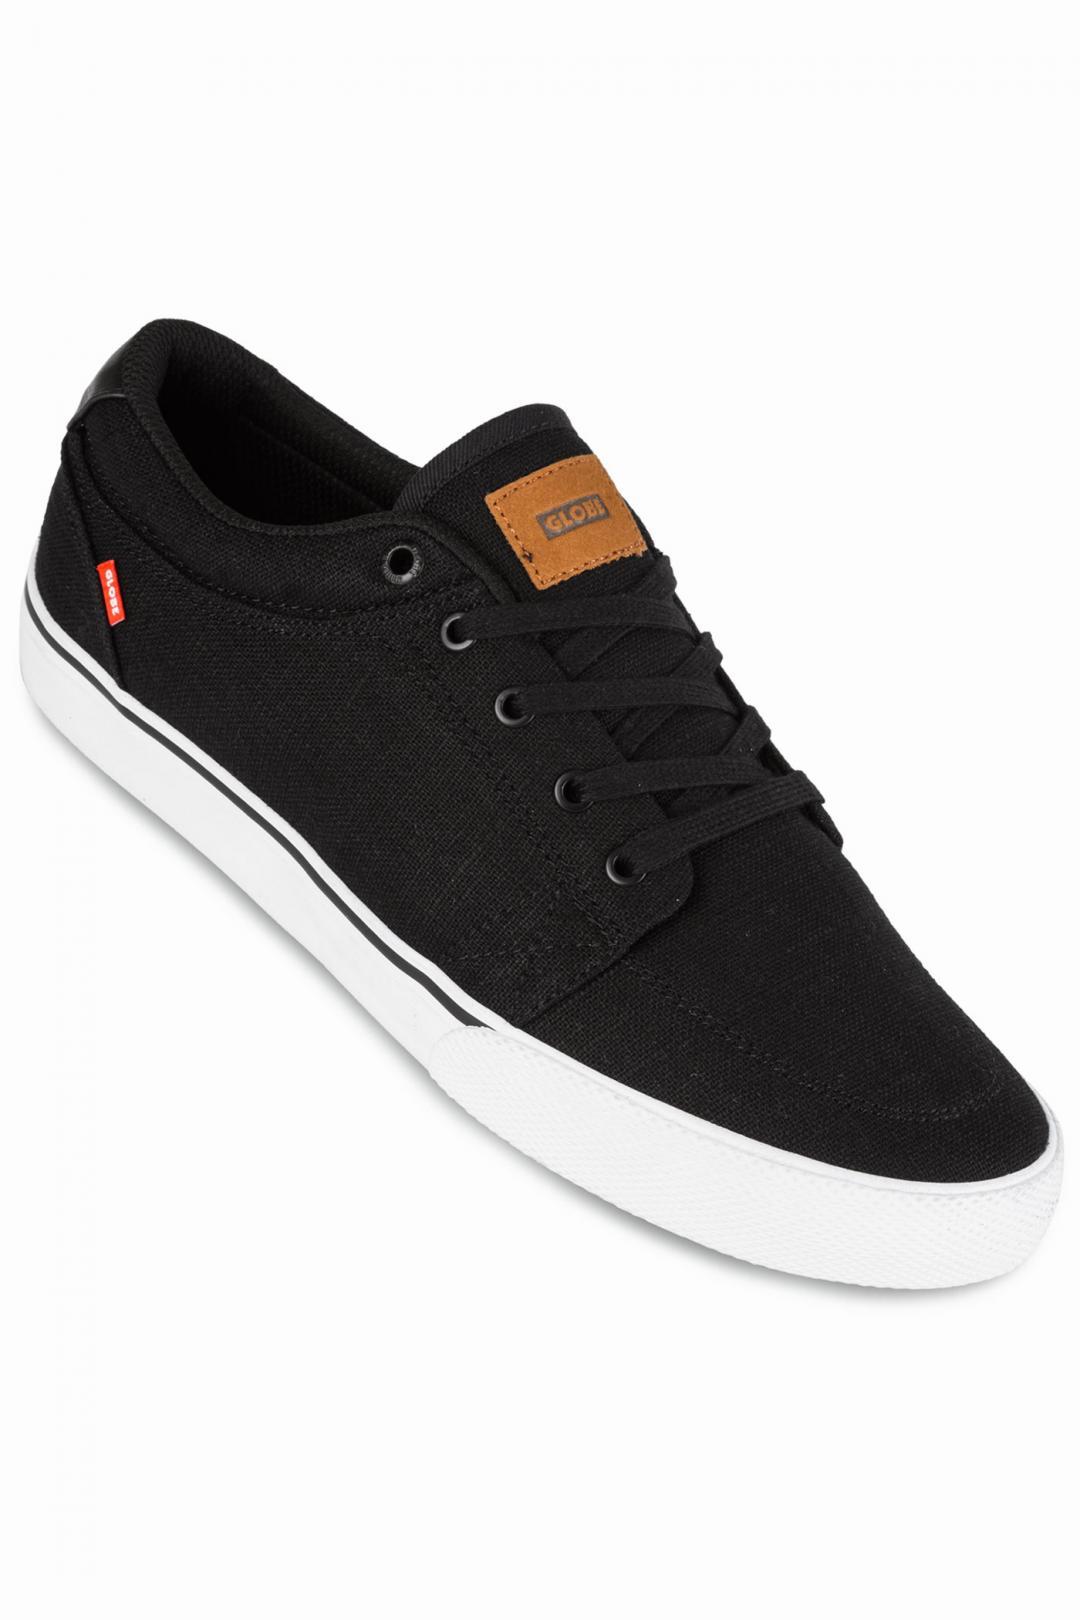 Uomo Globe GS Canvas black hemp | Sneakers low top